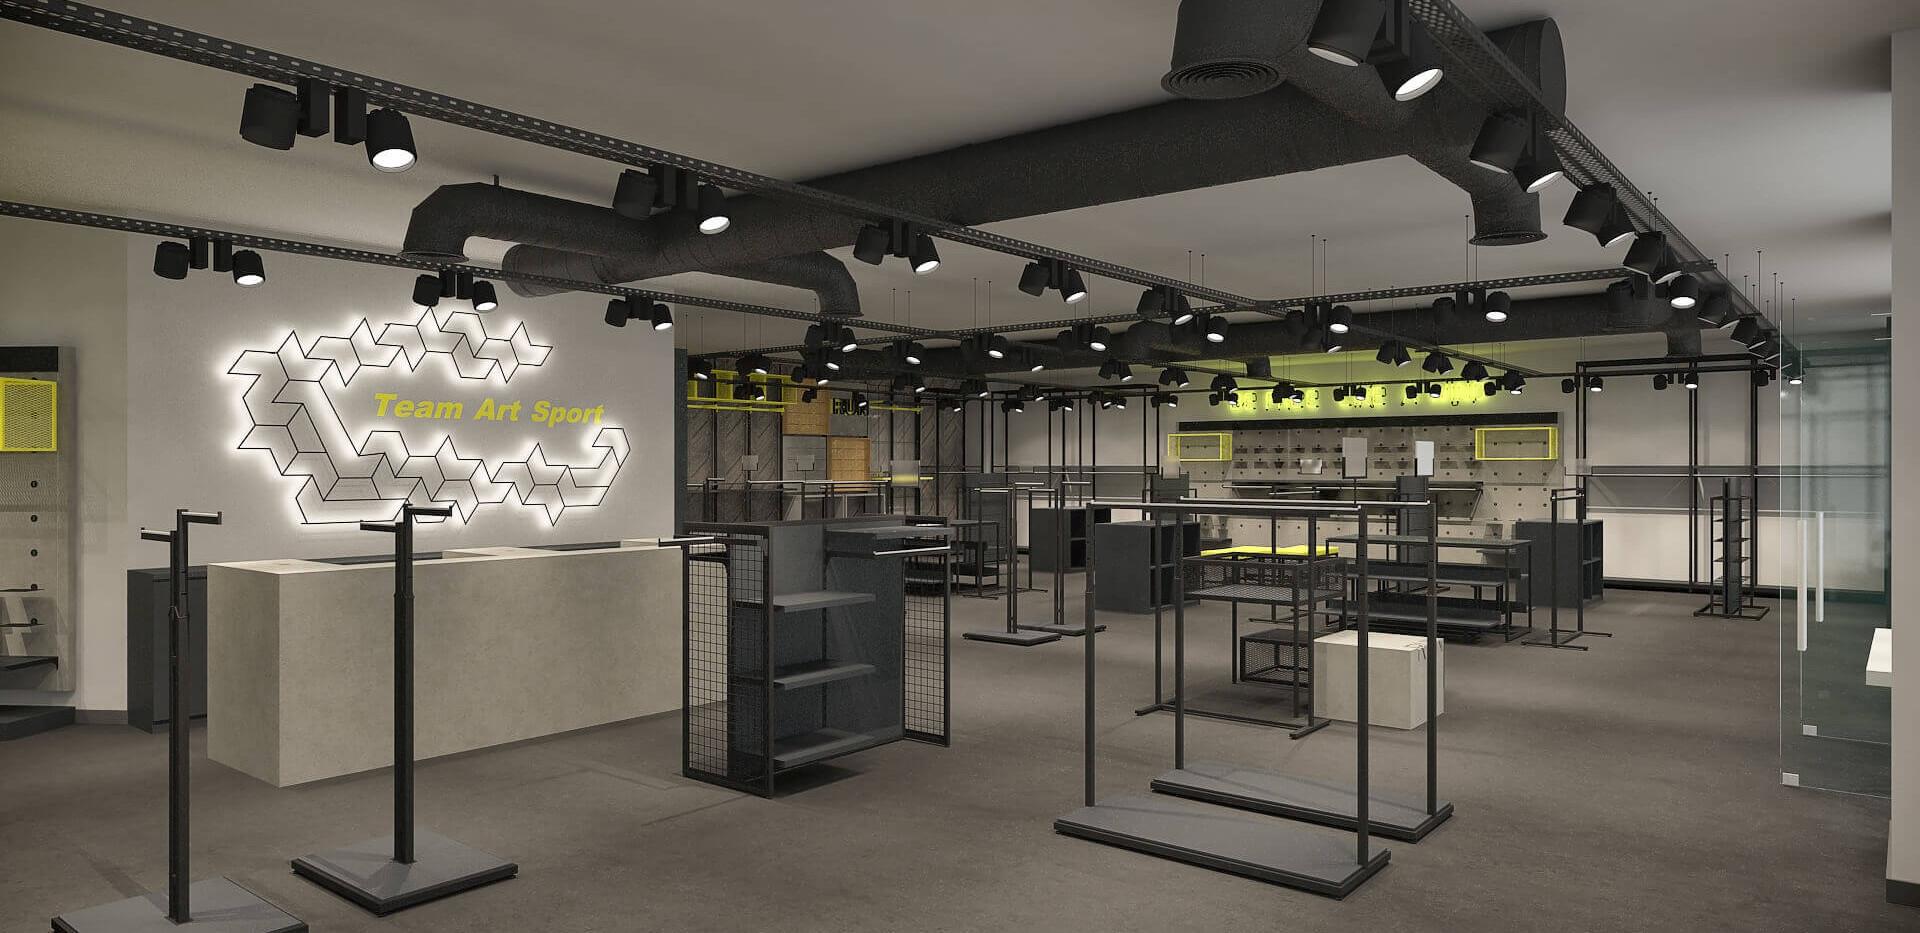 Team Sport - Sports Store Shop Design-2.